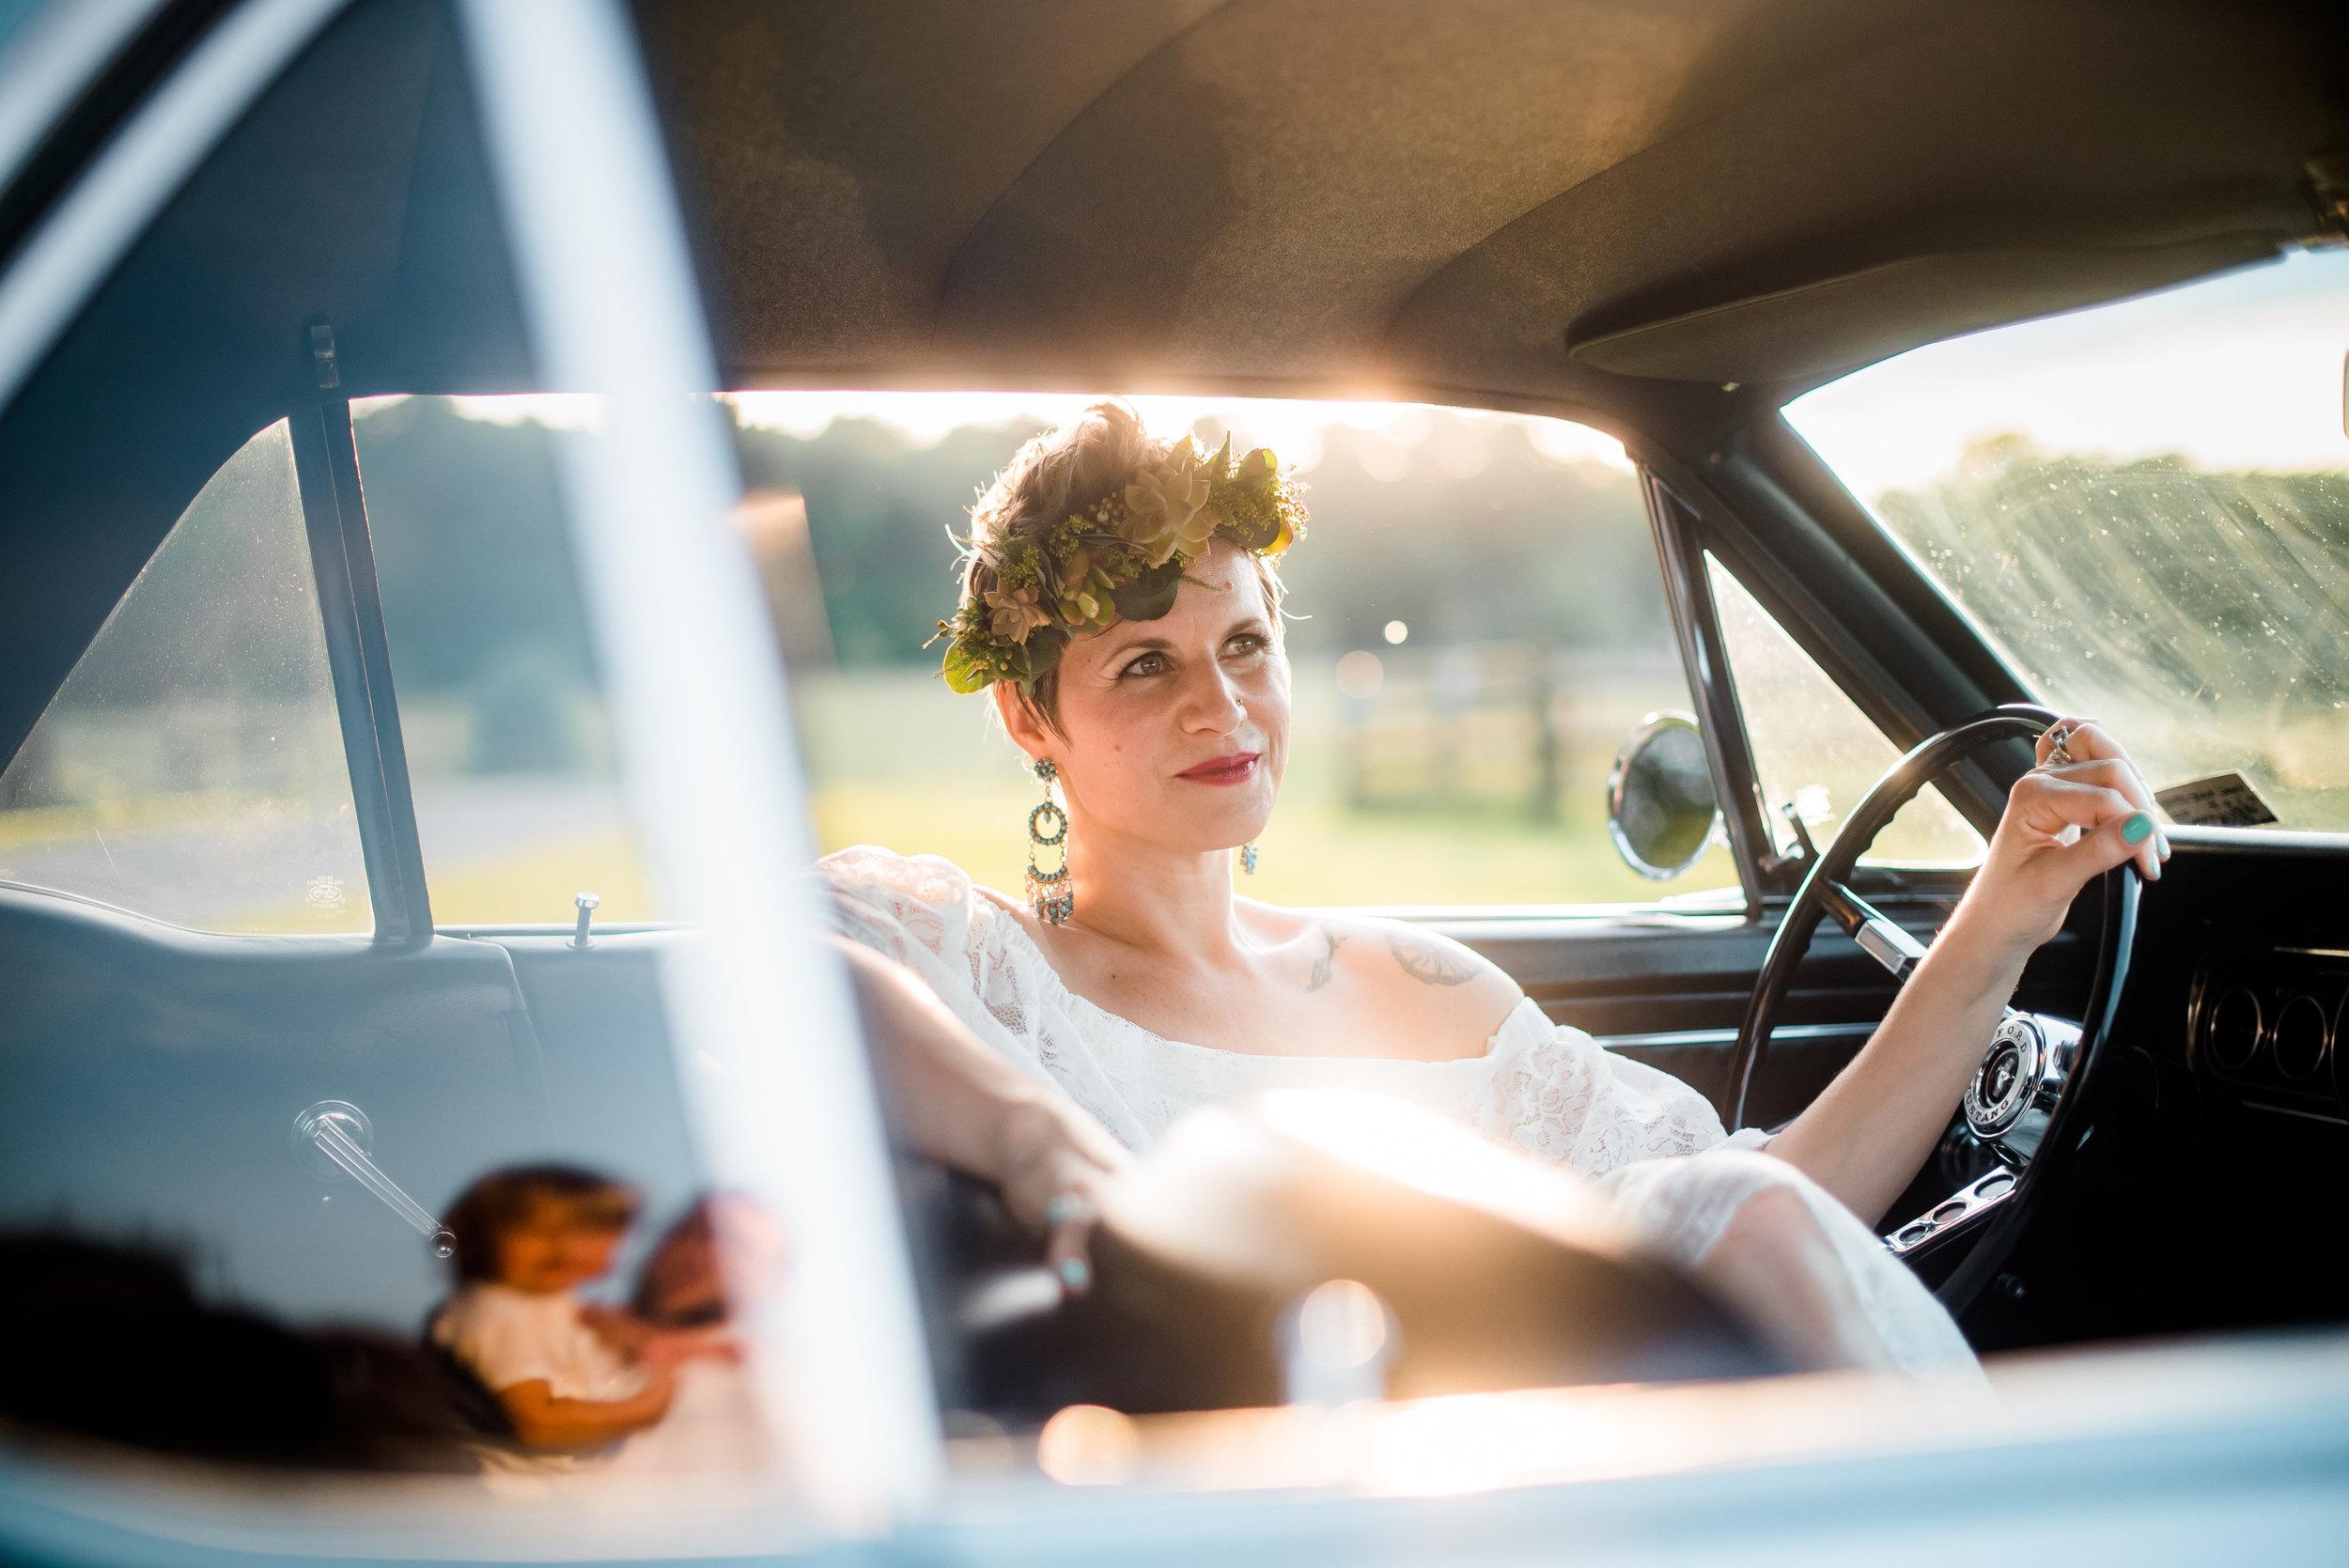 pittsburgh-wedding-photographer-armstrongfarms-eclectic-offbeat-boho0150.jpg